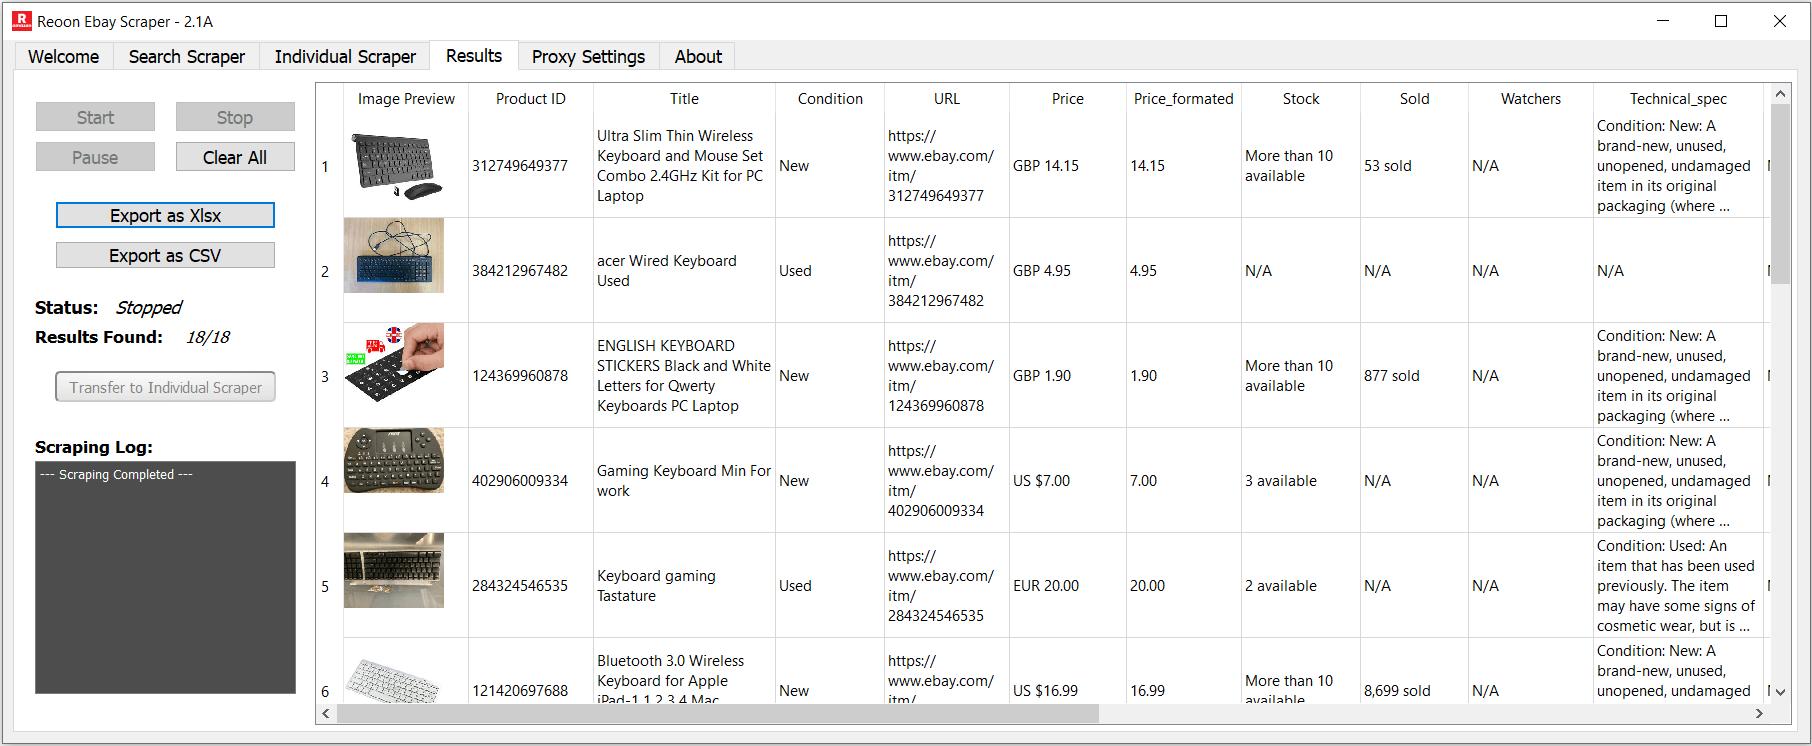 Reoon Ebay Scraper - Products Scraper Results